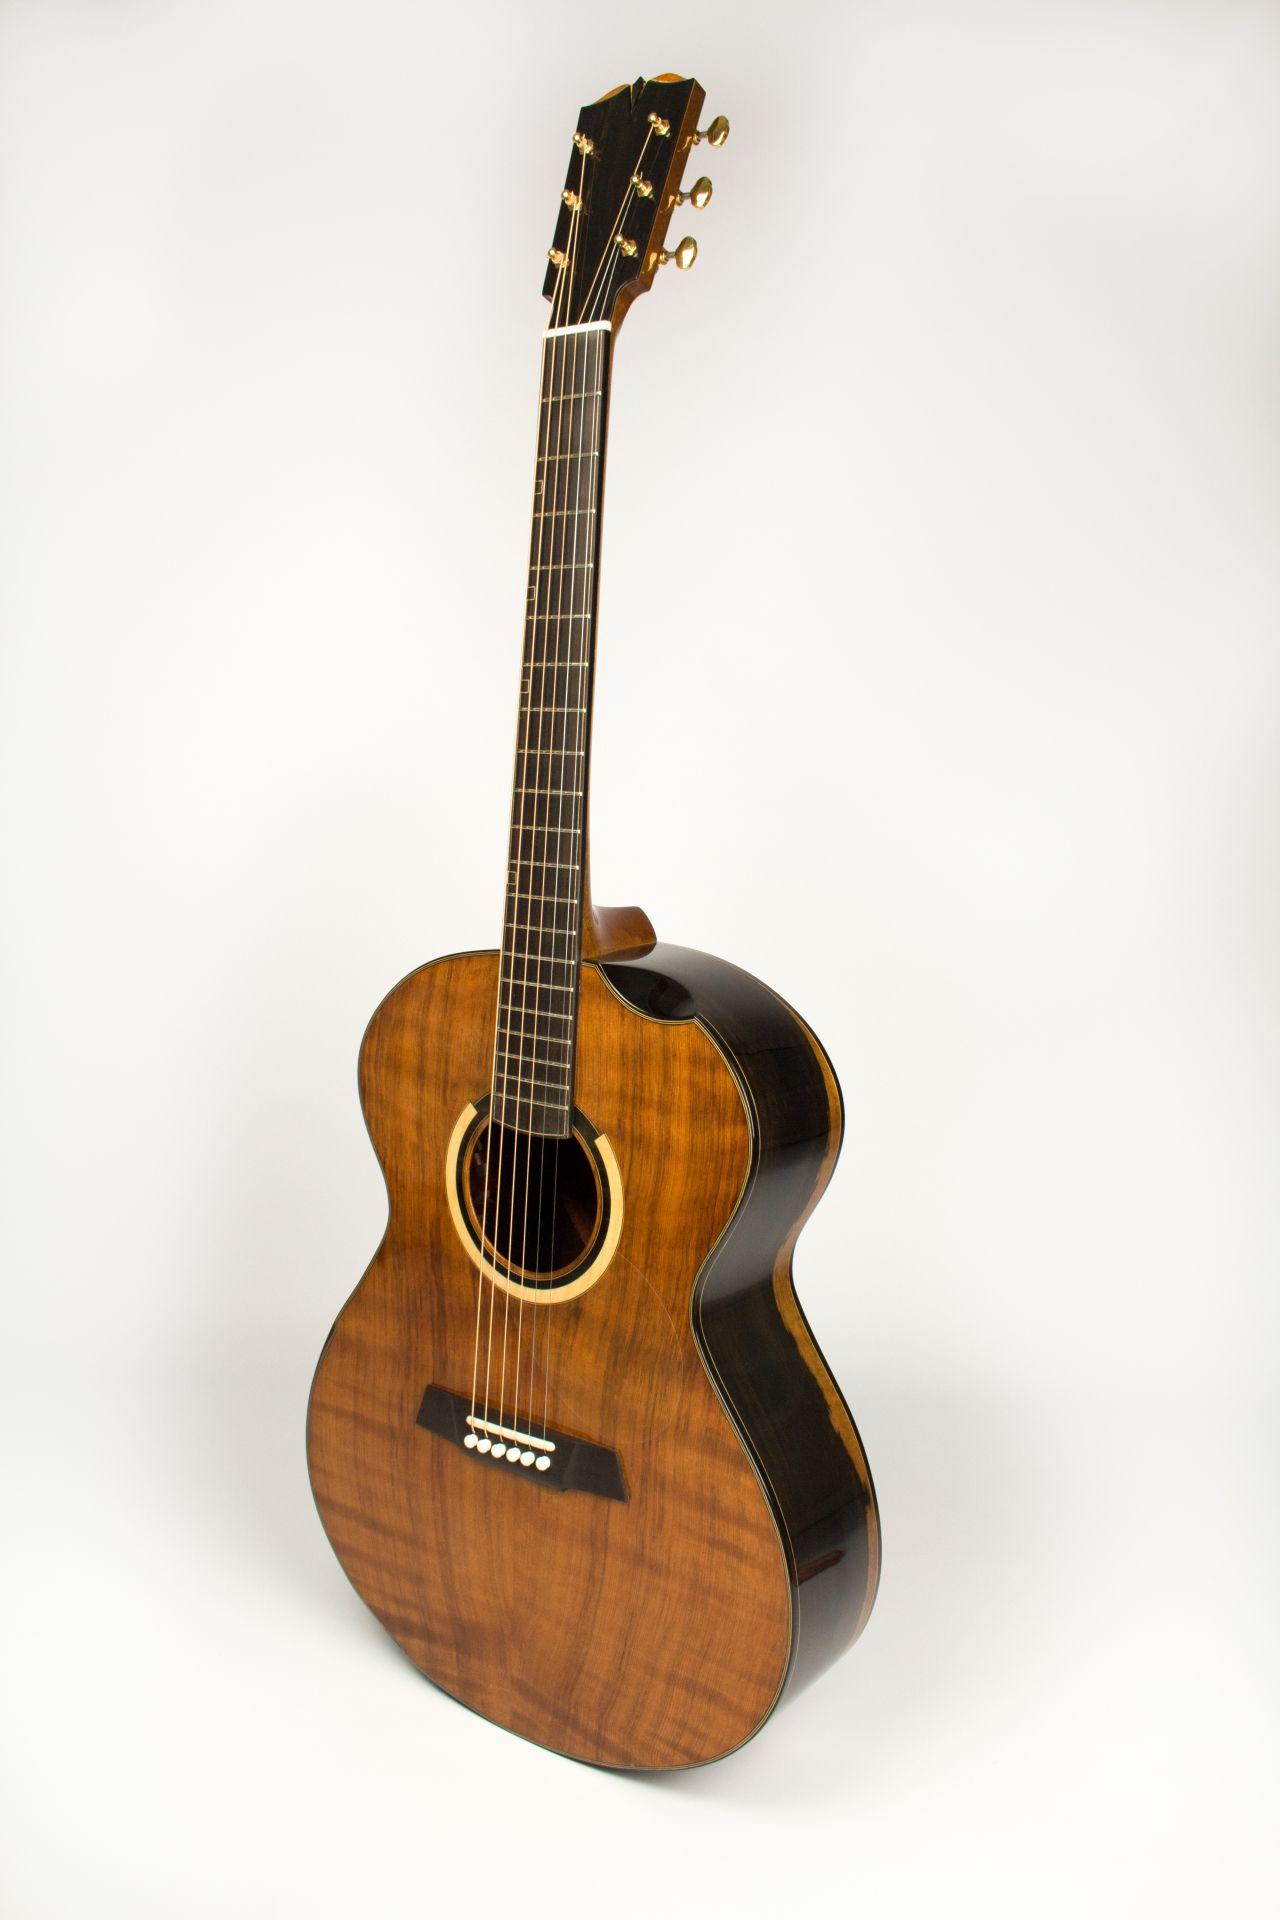 Handmade Custom Acoustic Guitar Photo Video Gallery Guitarra Electroacustica Guitarras Modelos